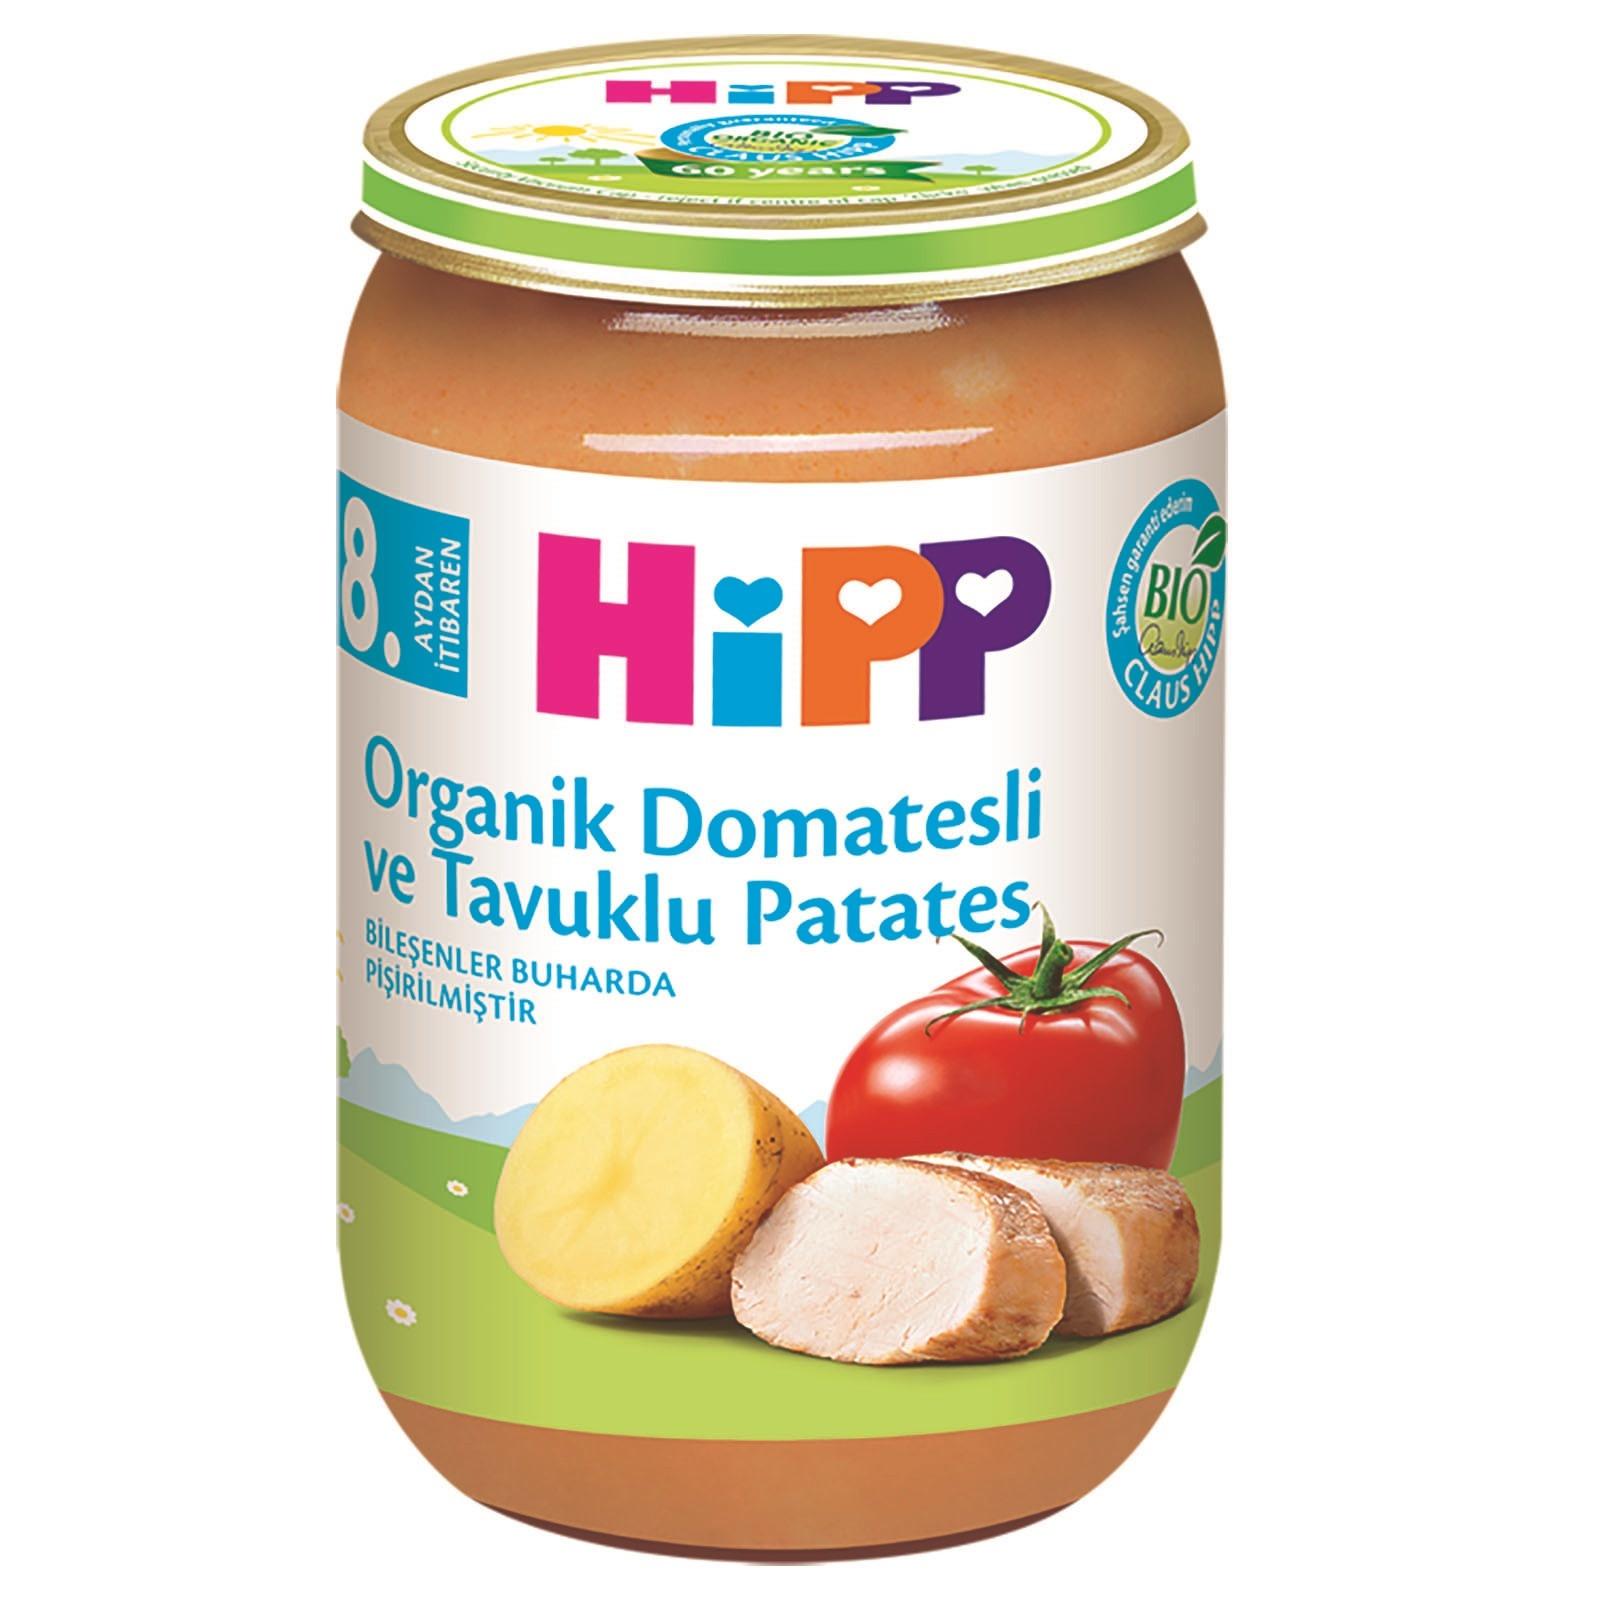 Hipp Organik Domatesli ve Tavuklu Patates 220 gr